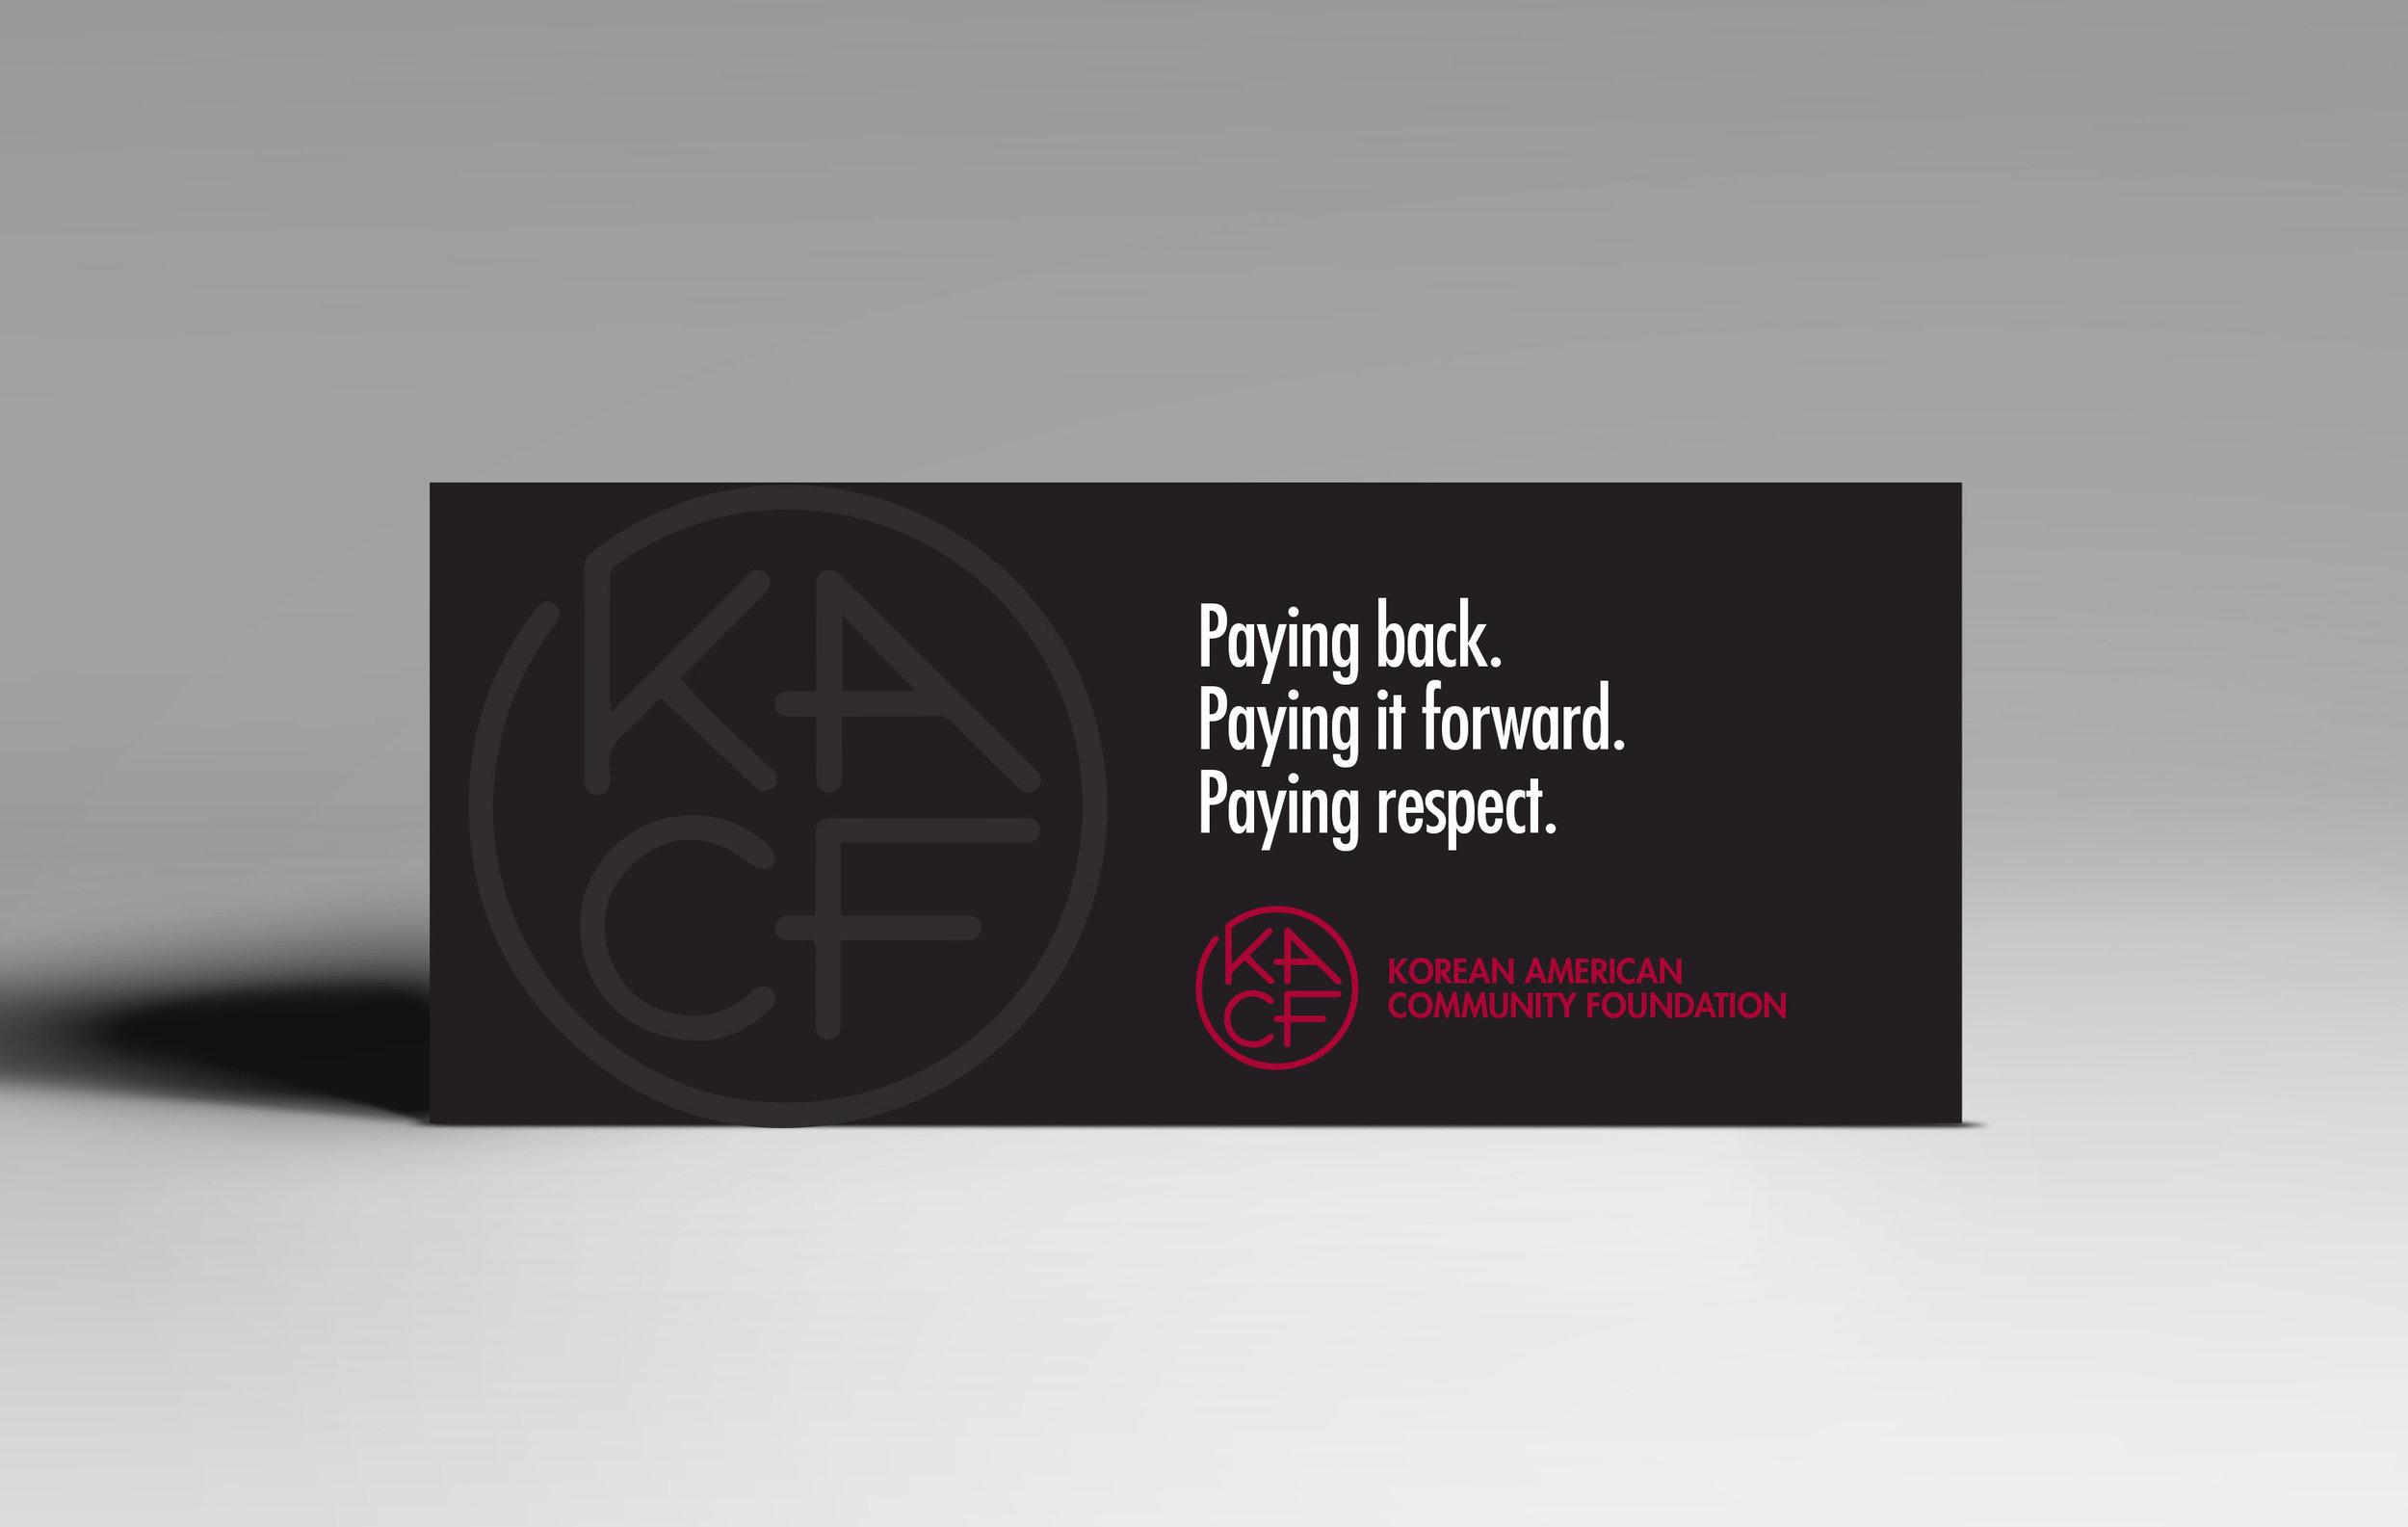 KACF Case Study 1.13_For Website_Page_09.jpg